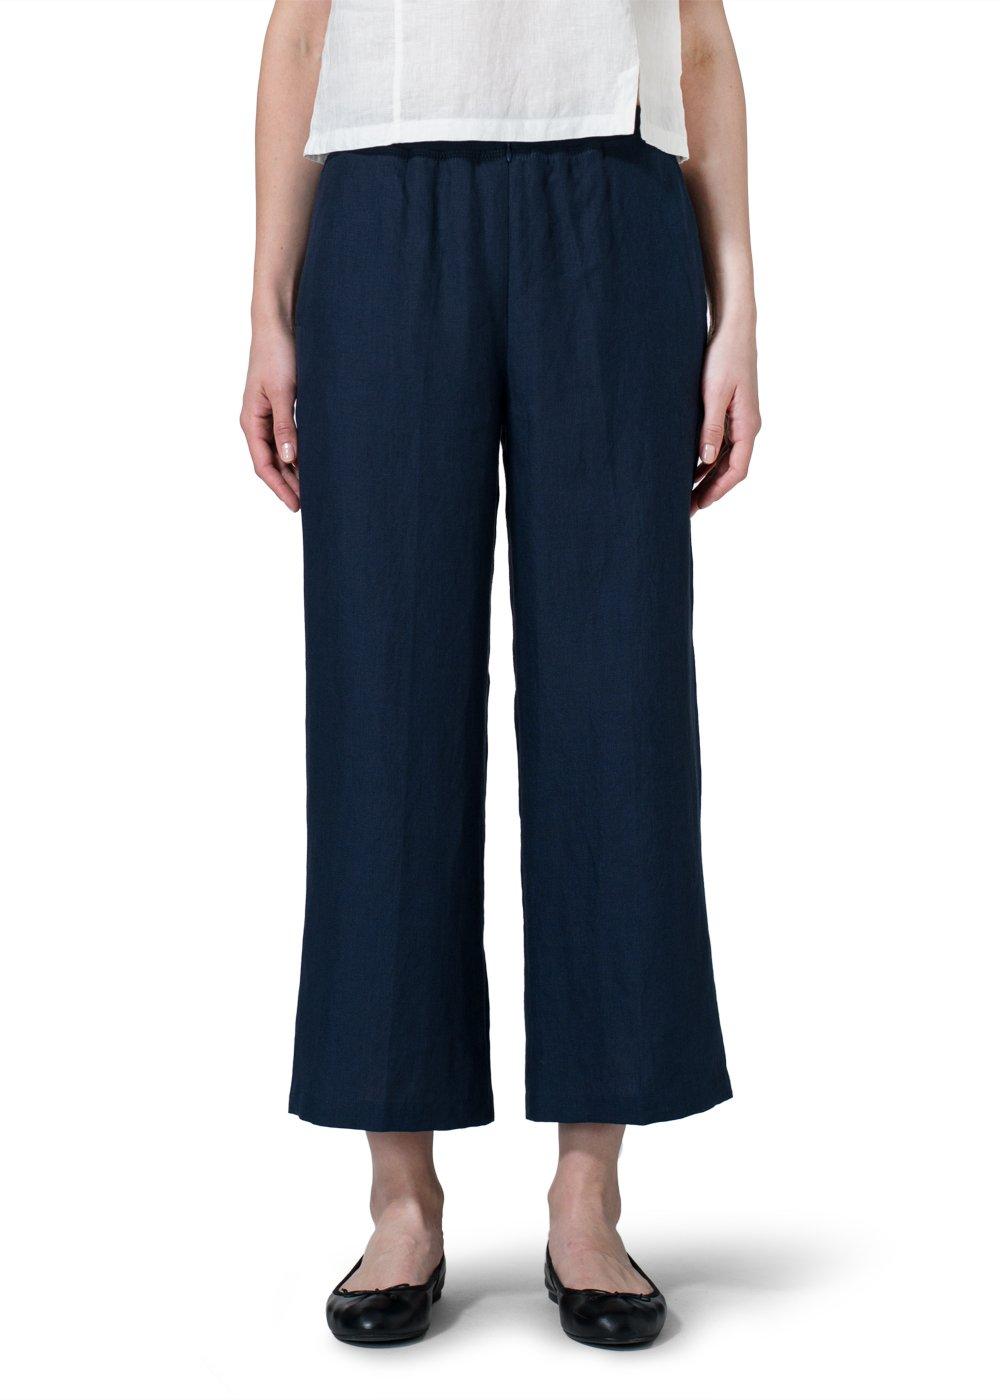 Vivid Linen Relaxed Crop Pants-1X-Navy Blue